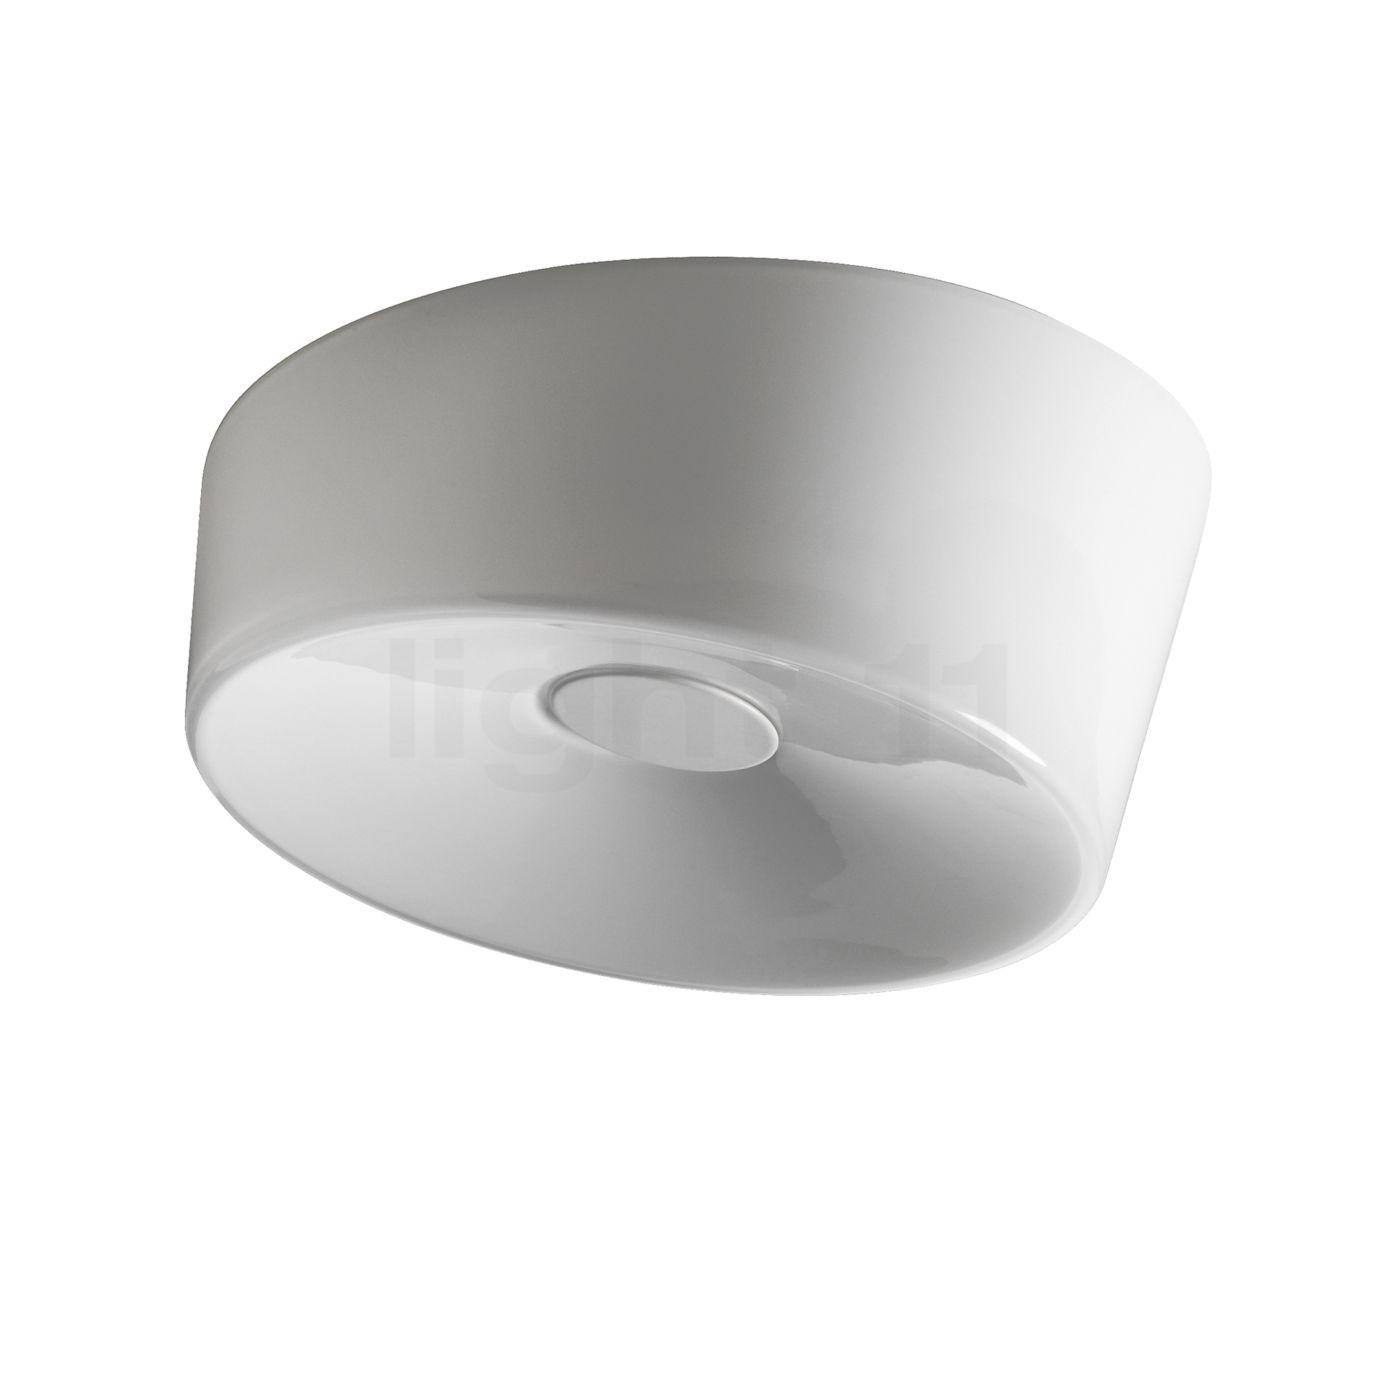 foscarini lumiere xxl parete soffitto deckenleuchte. Black Bedroom Furniture Sets. Home Design Ideas